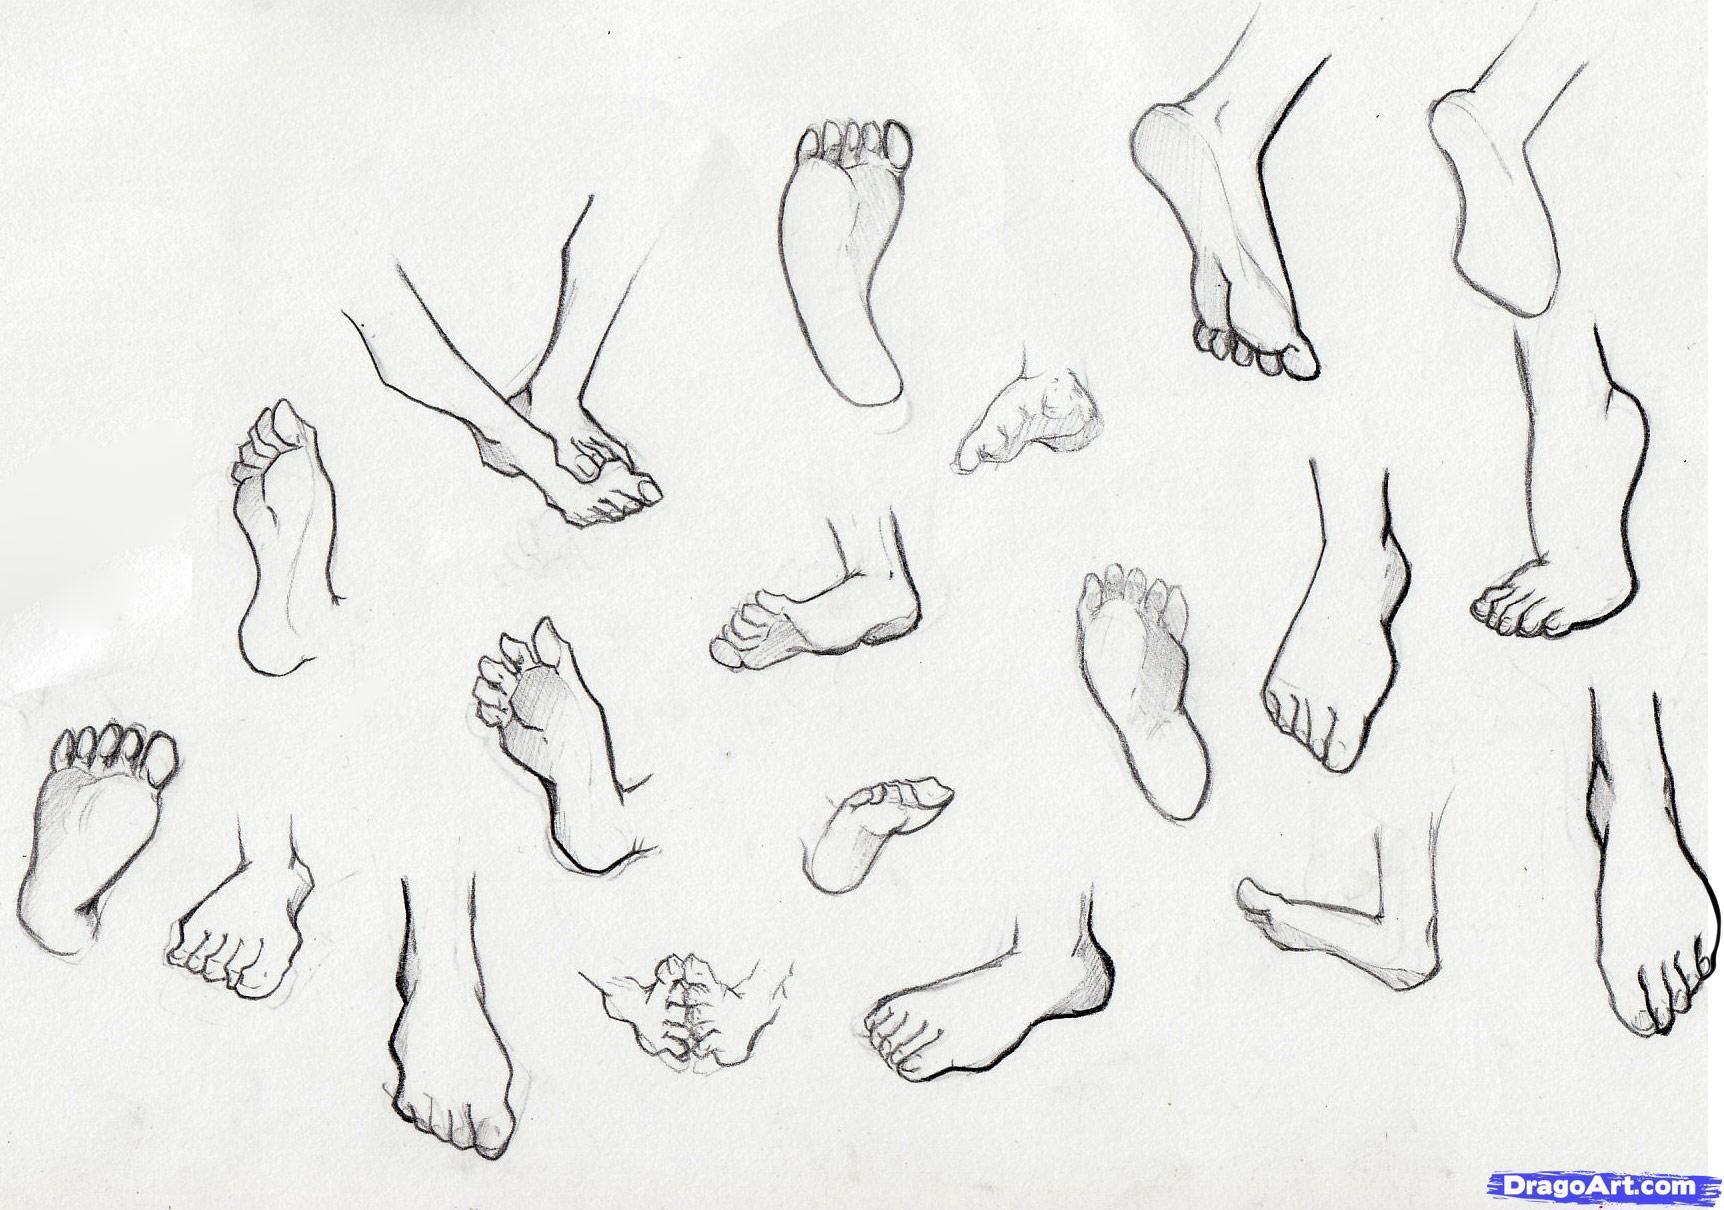 Hentai drawing tutorial | Feet / Pieds | Pinterest